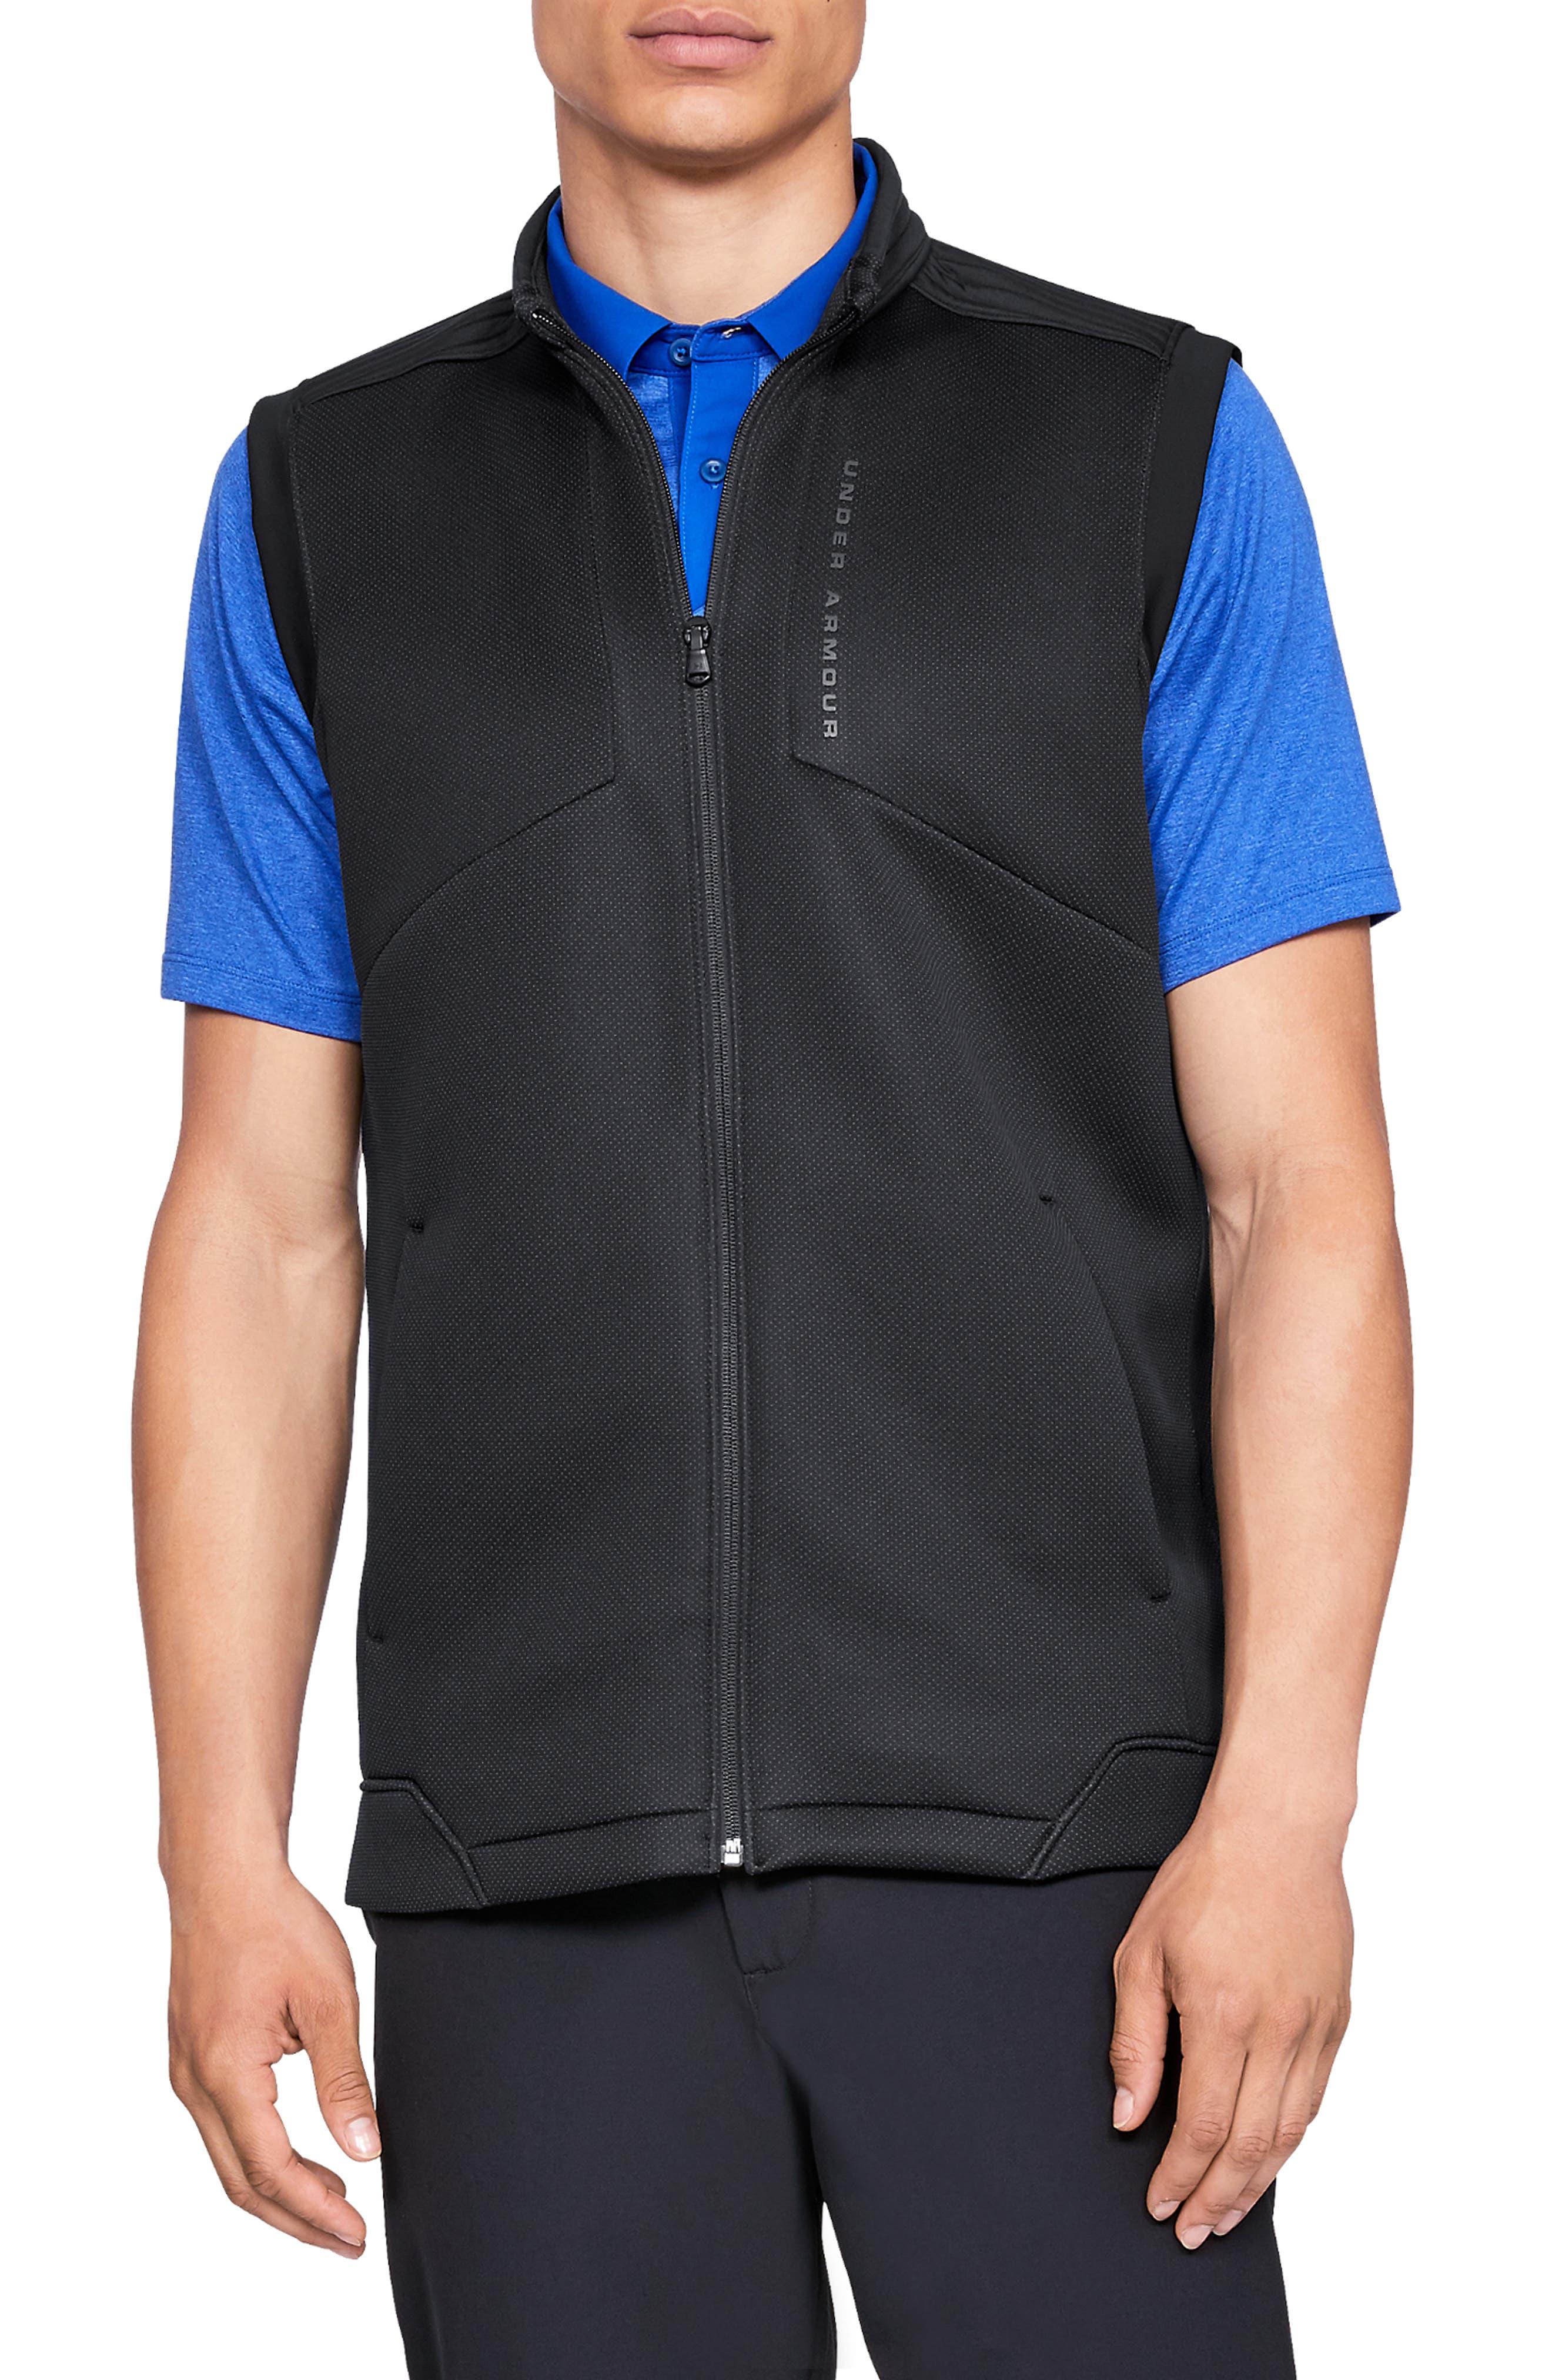 Under Armour Storm Daytona Vest, Black